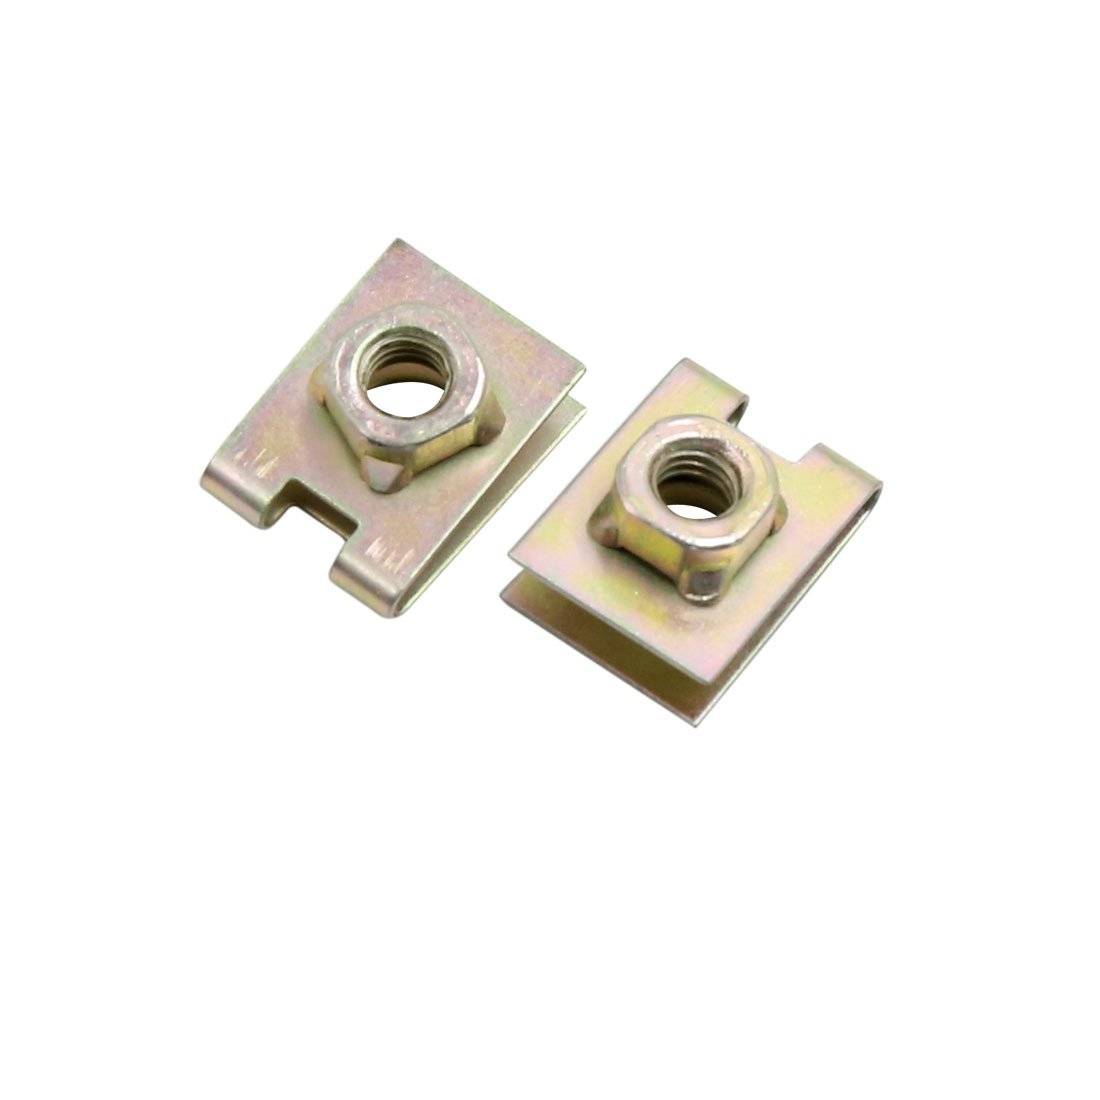 50Pcs 5mm Hole Metal Screw Fastener Door Pannel U-Type Clips Rivets for Auto Car